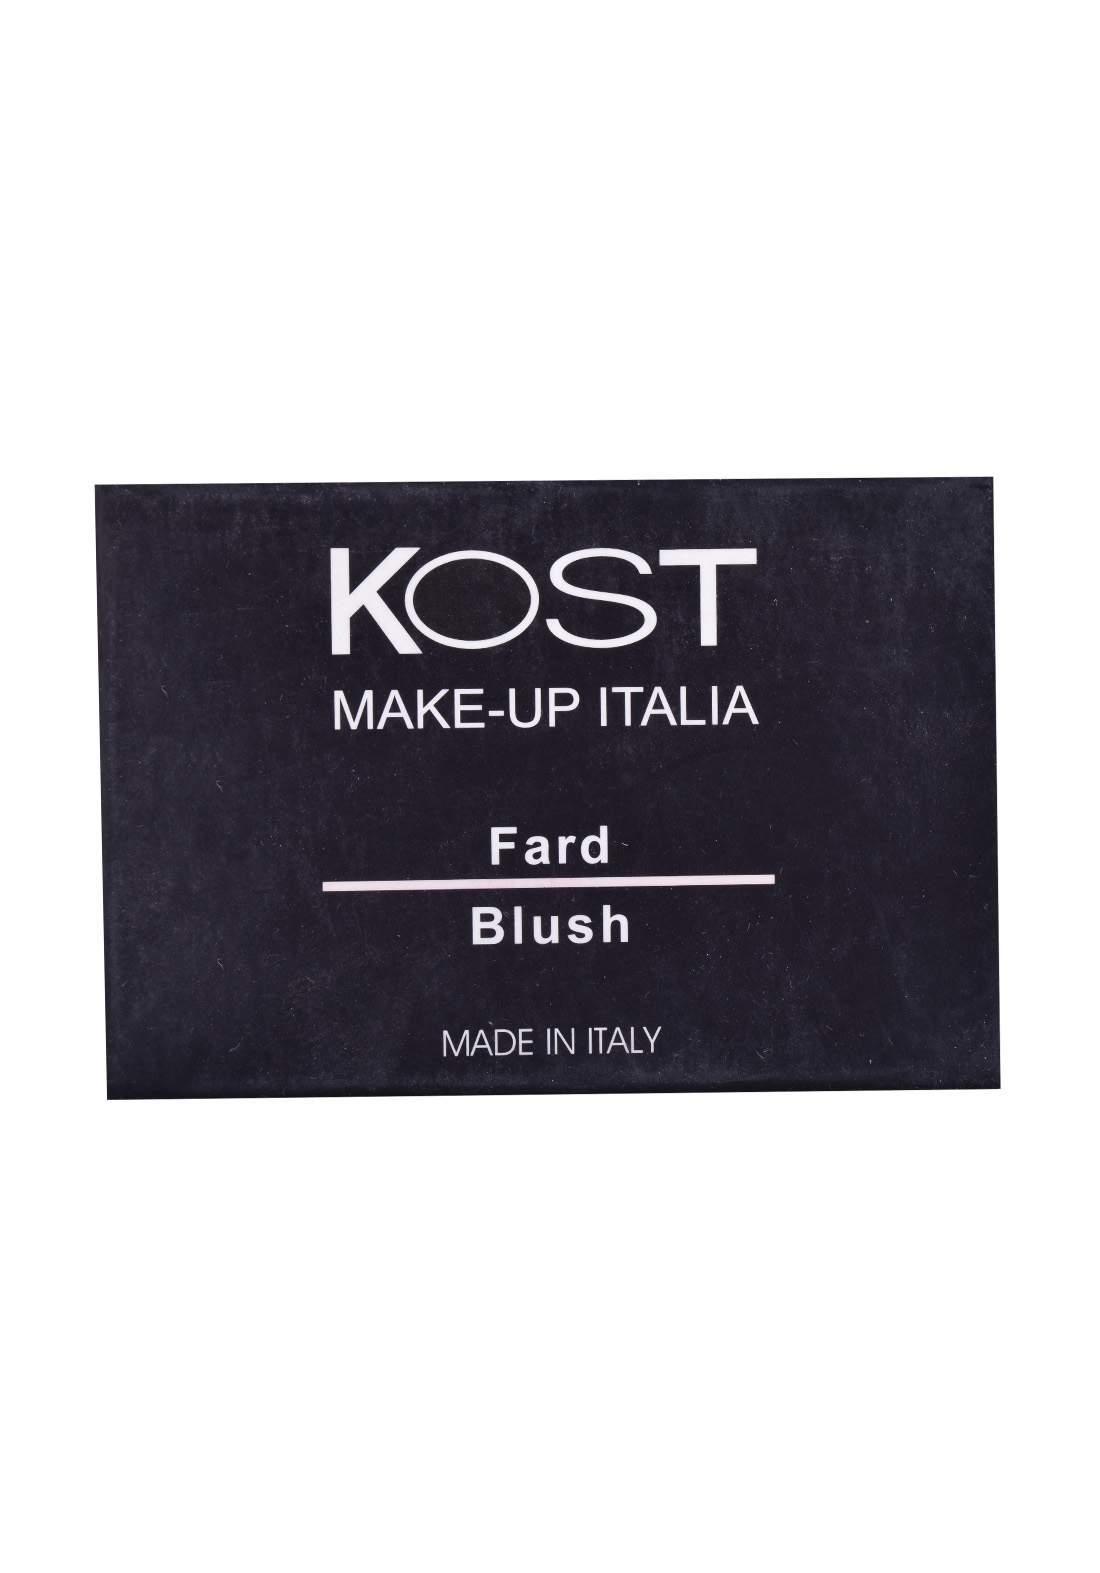 Kost Make Up Italia Fard Blush No.27 احمر خدود